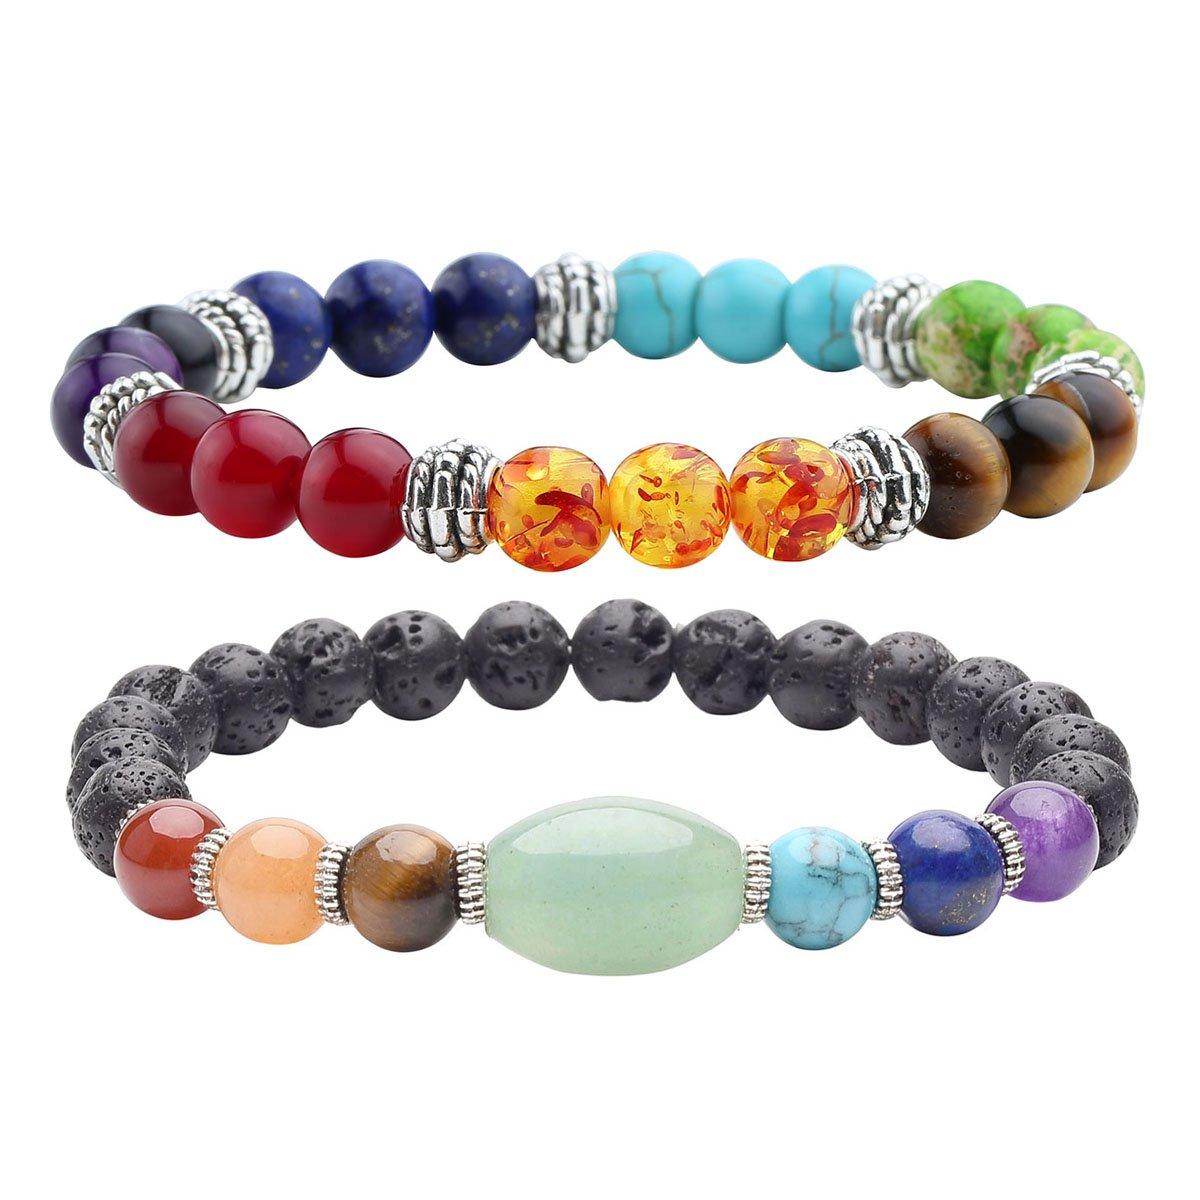 Top Plaza Lava Stone Diffuser Bracelet - Aromatherapy 7 Chakra Tree of Life Charm Yoga Meditation Reiki Healing Crystals Bracelets ATPUS65242